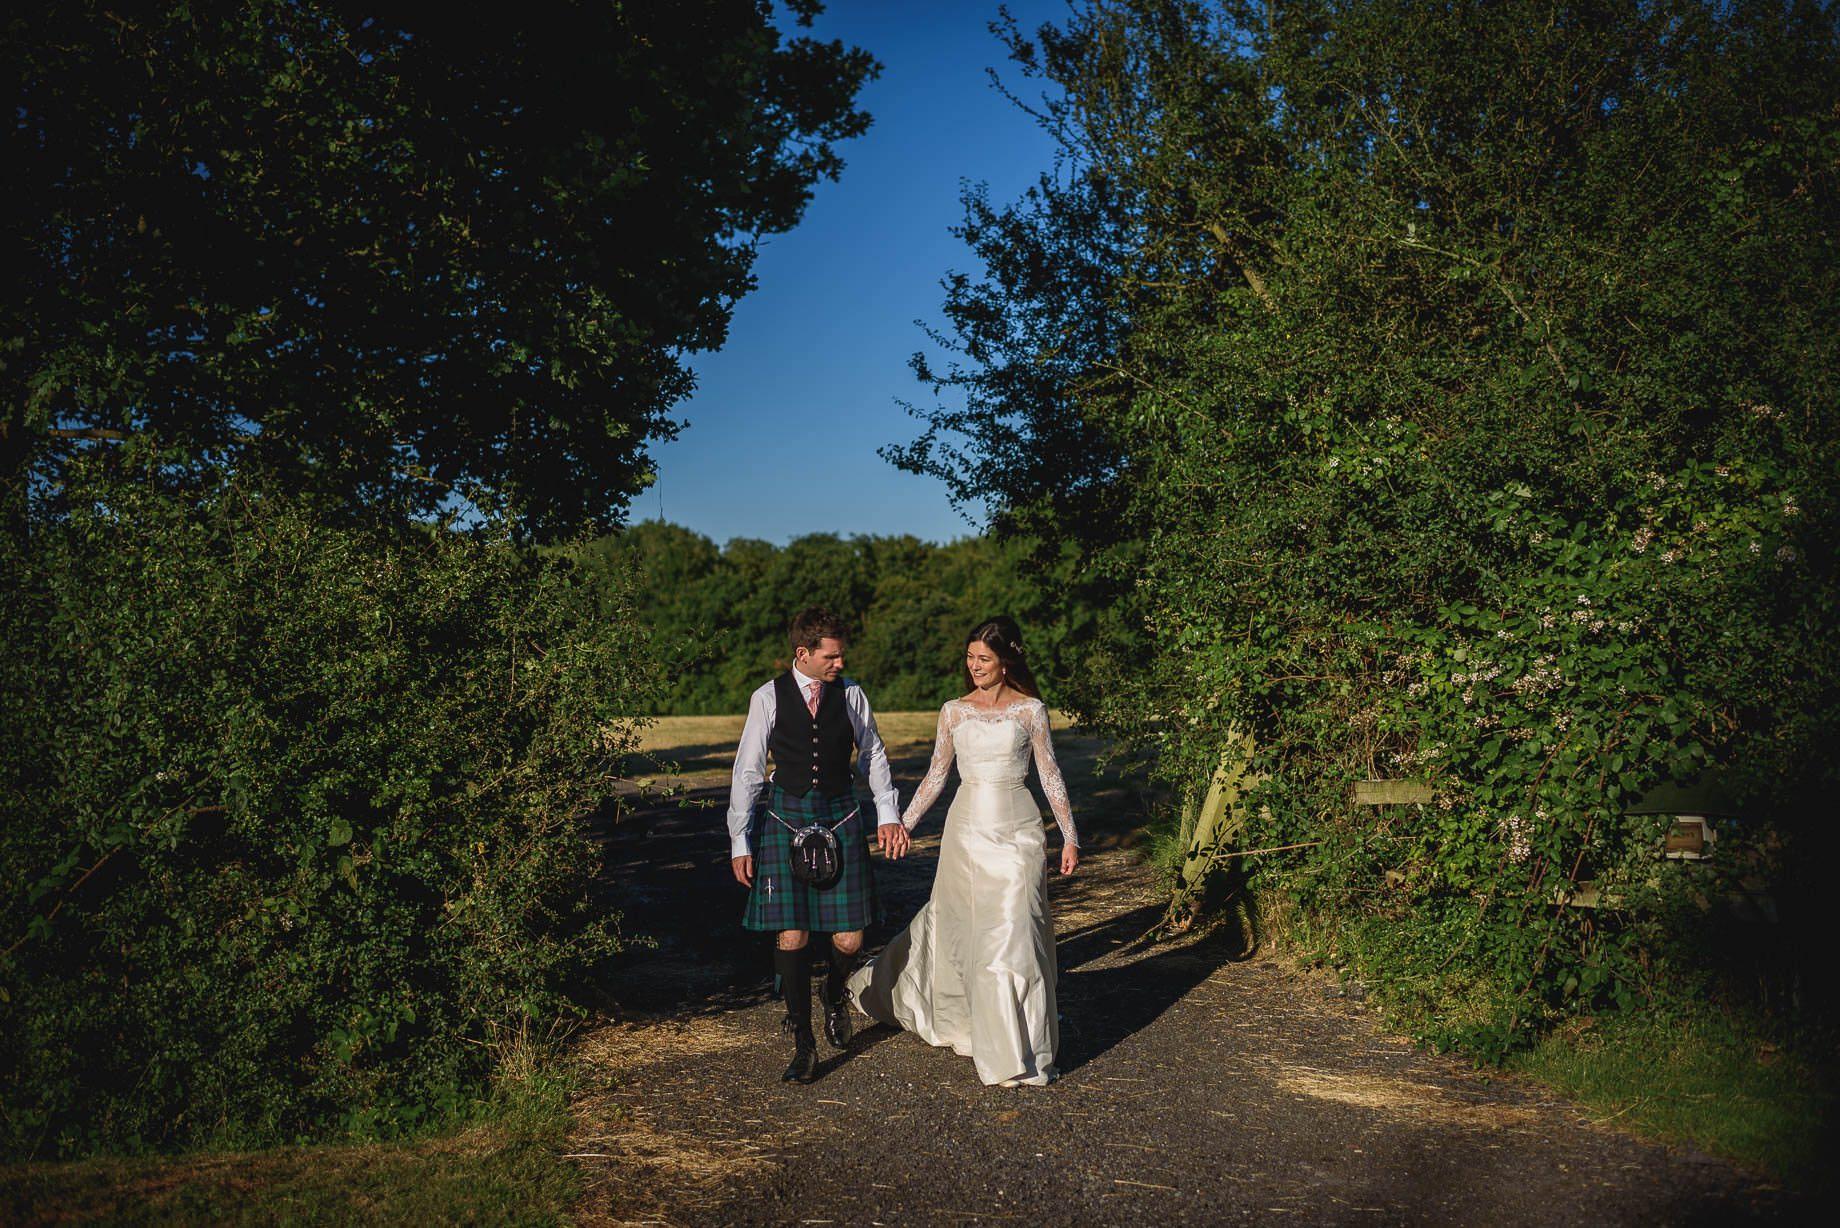 Gildings Barn wedding photography - Sarah and Steve (166 of 190)